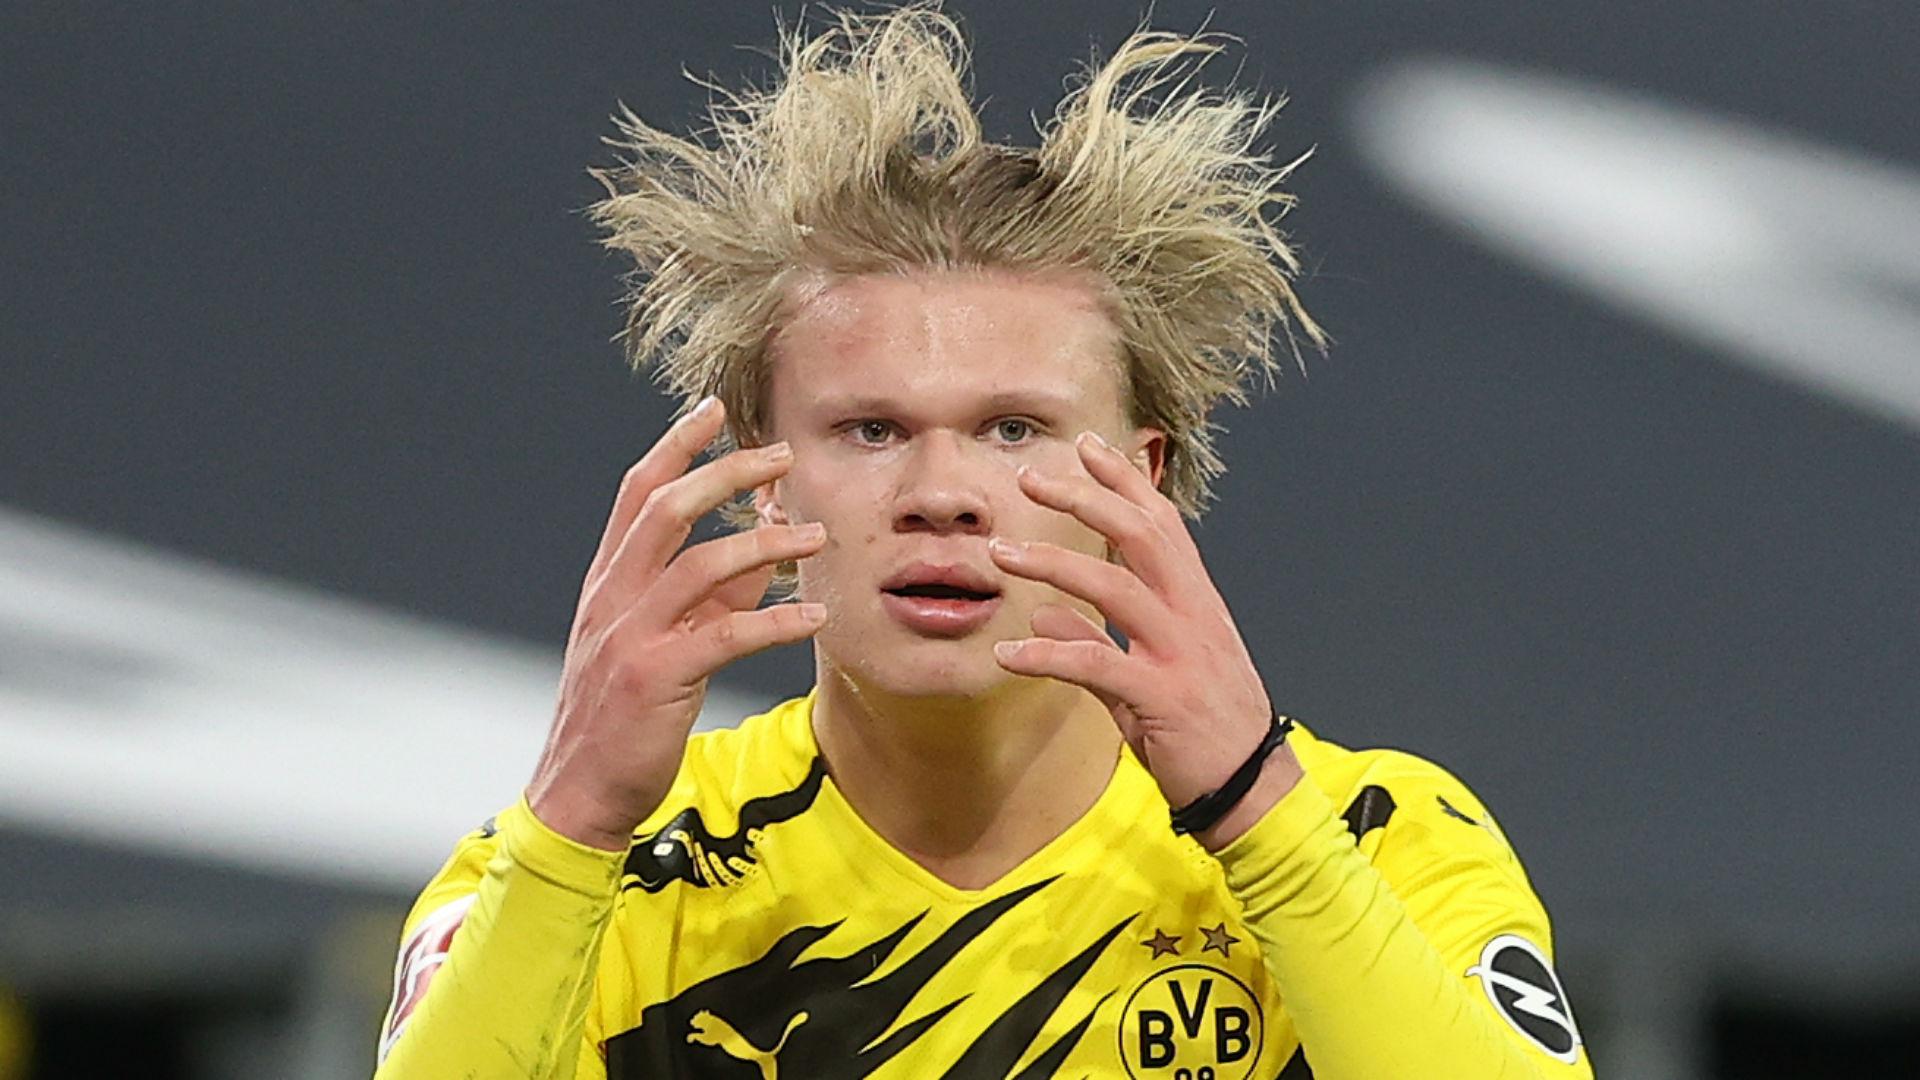 Dortmund reveal Haaland 'looks good' to play in DFB-Pokal final